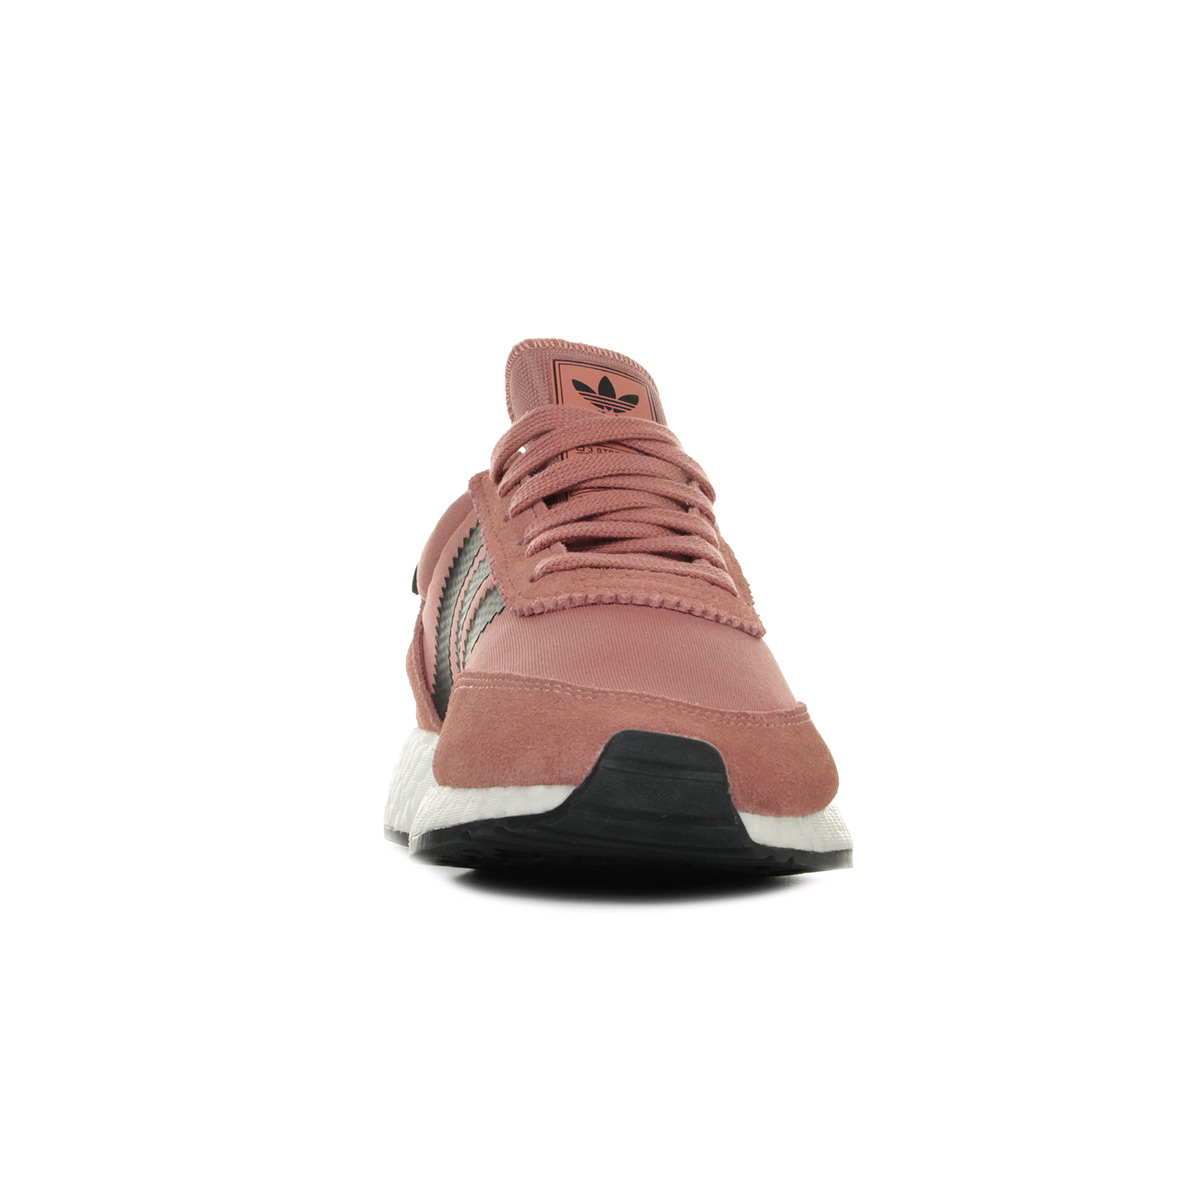 adidas Iniki Runner W BY9095, Baskets mode